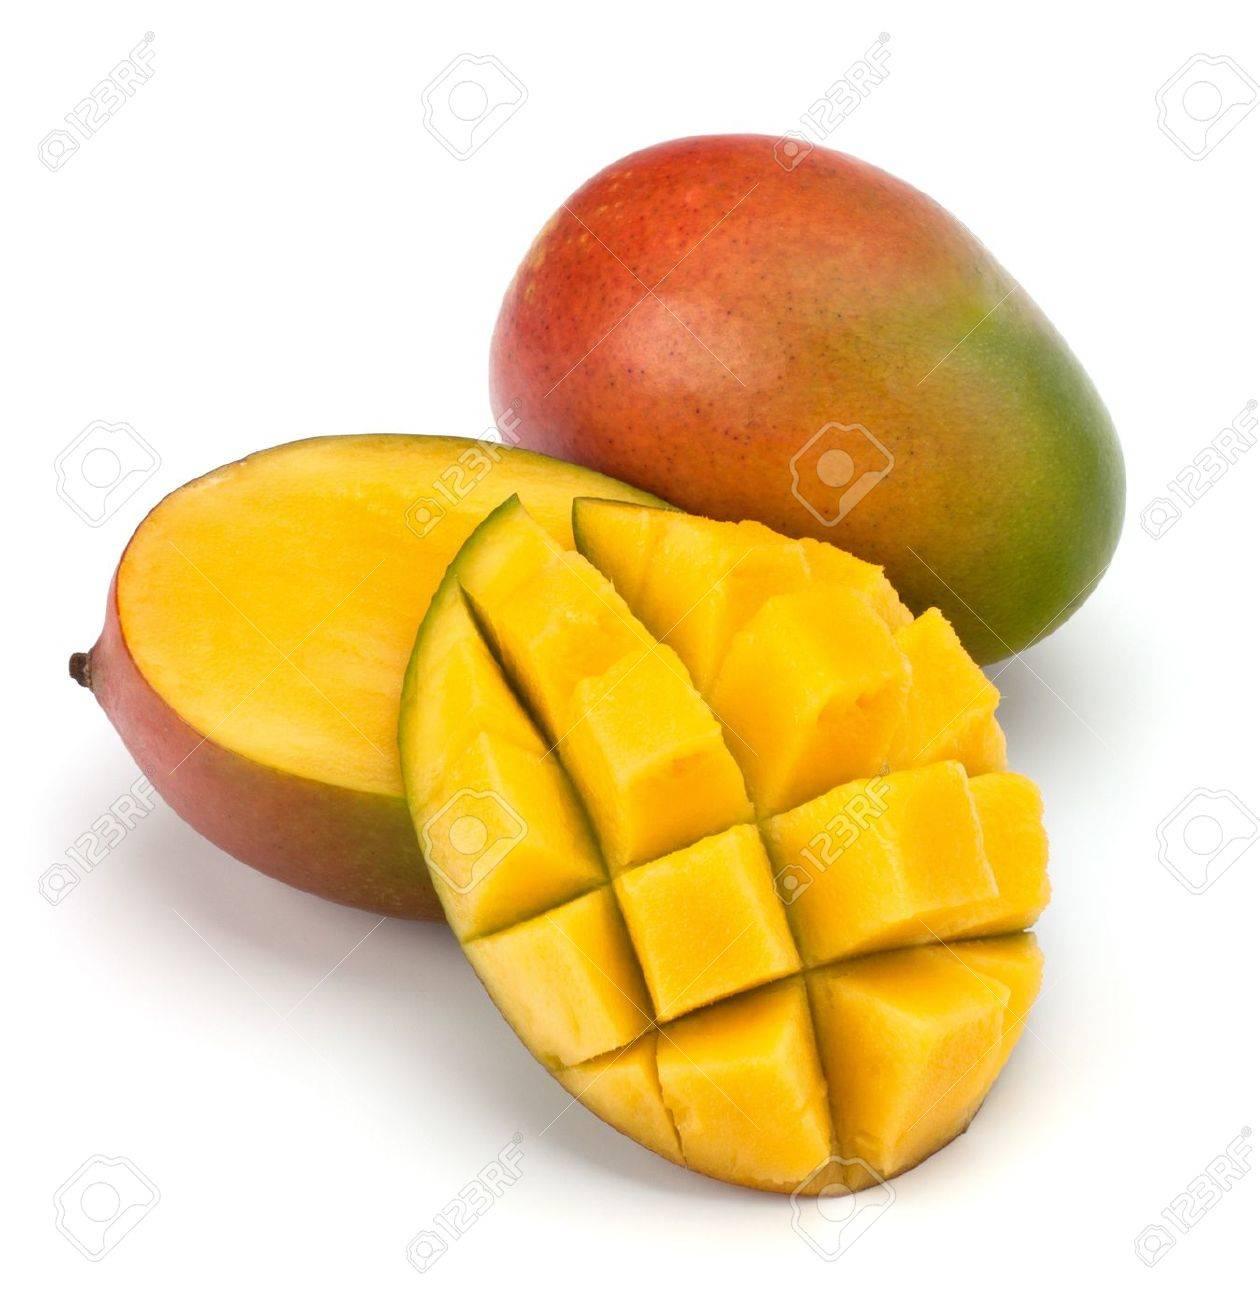 Mango Fruit Isolated On White Background Stock Photo, Picture And ...